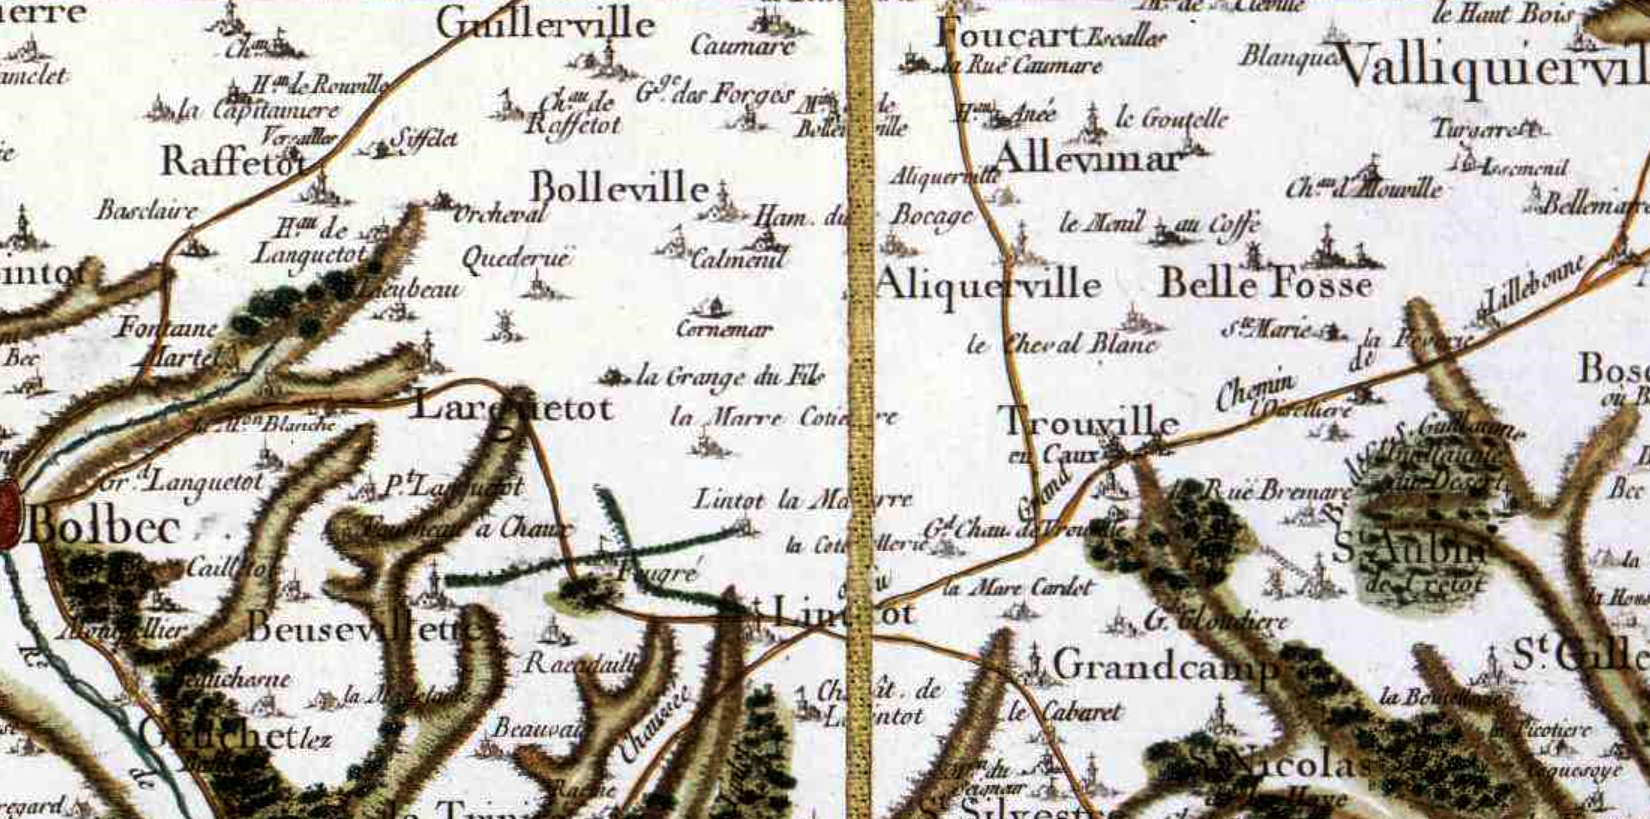 Bolleville seine maritime cassini